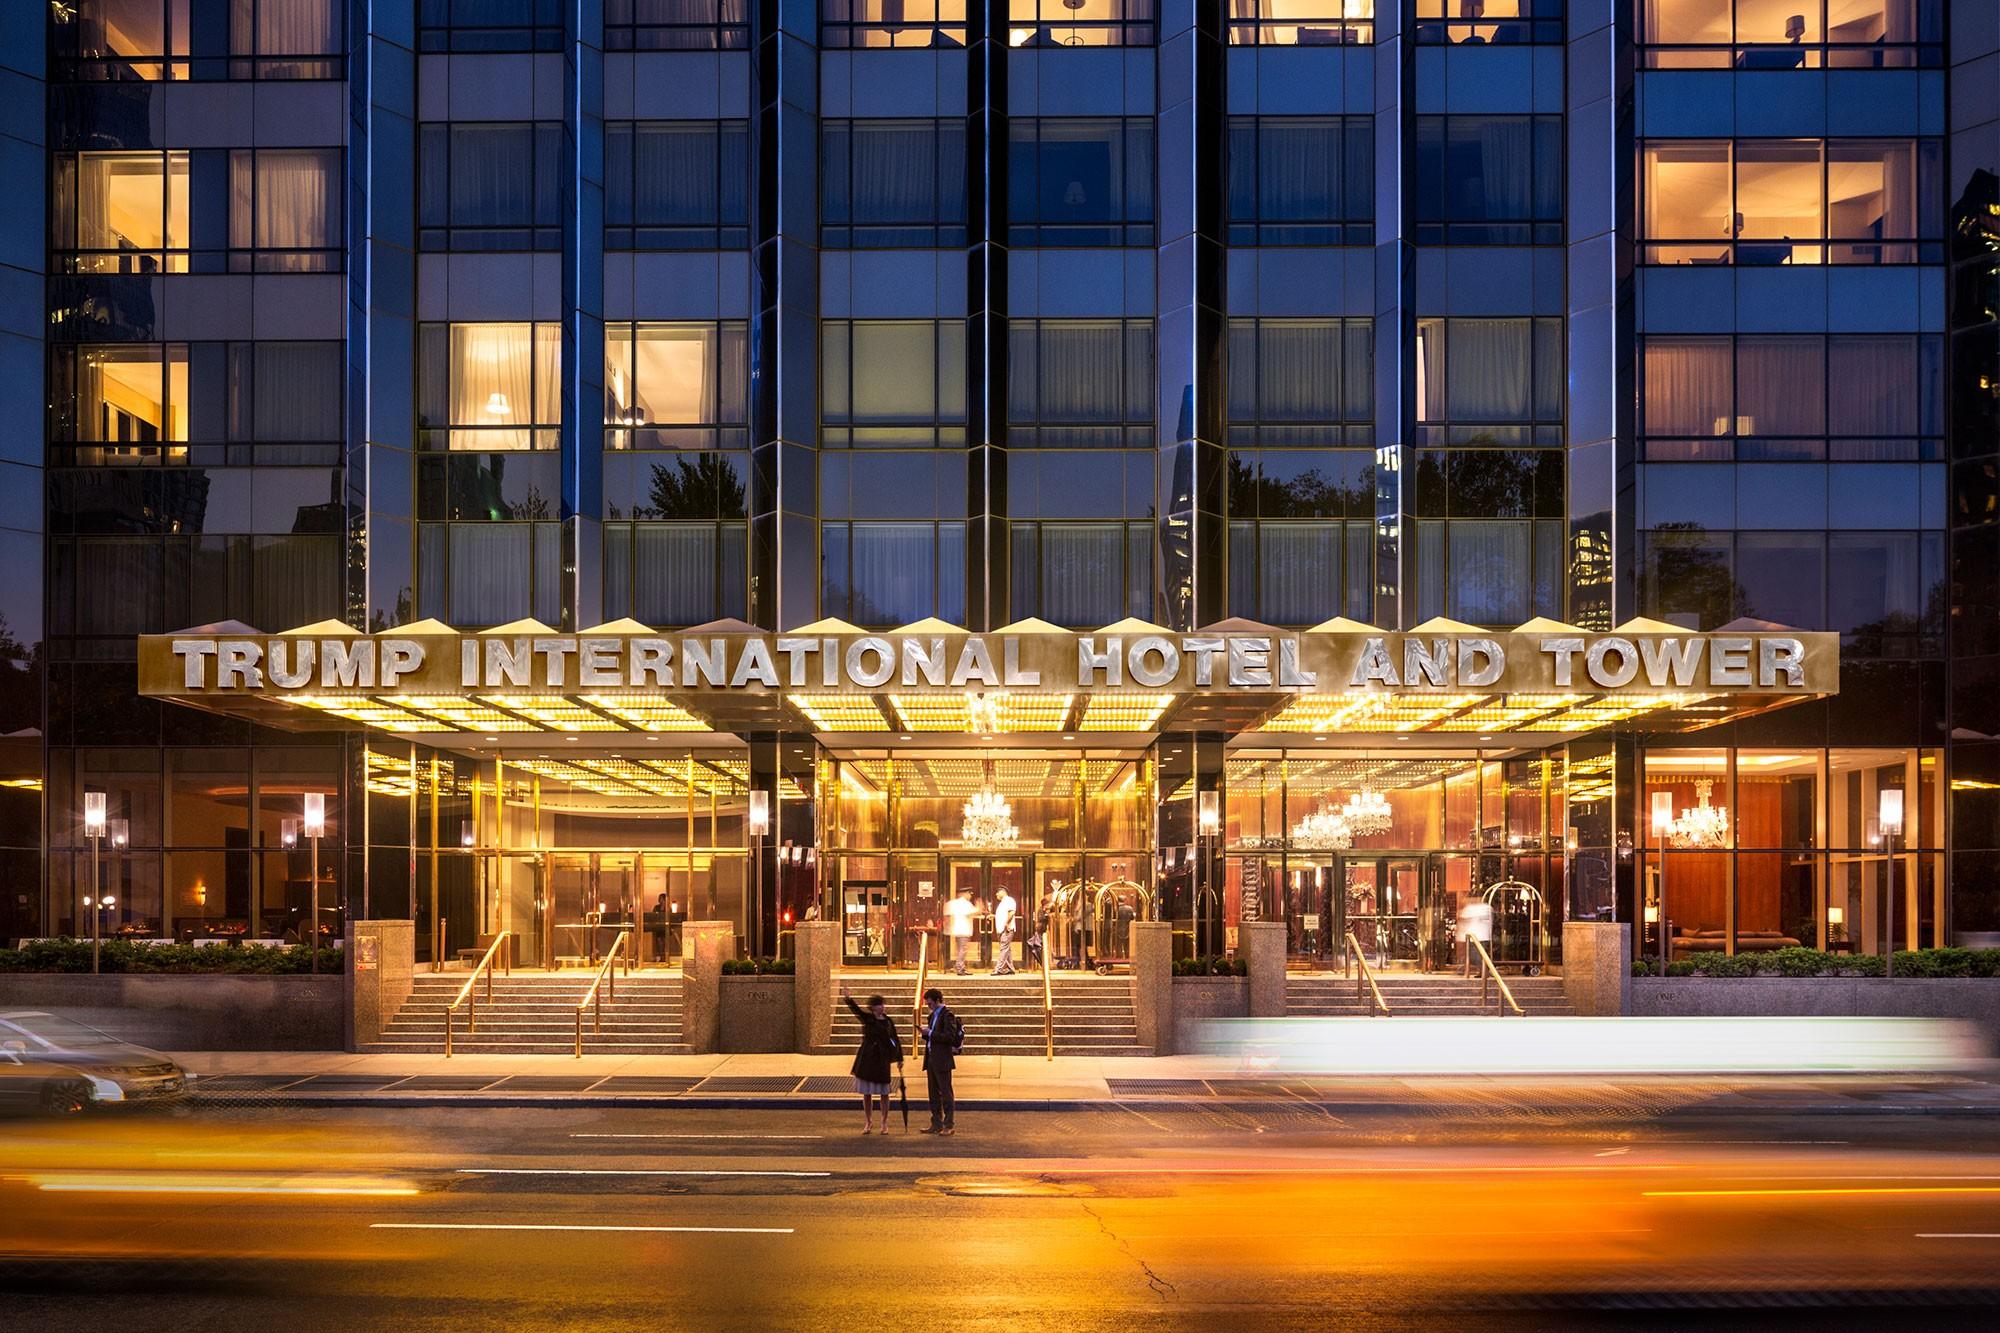 trump_international_hotel__tower.jpg